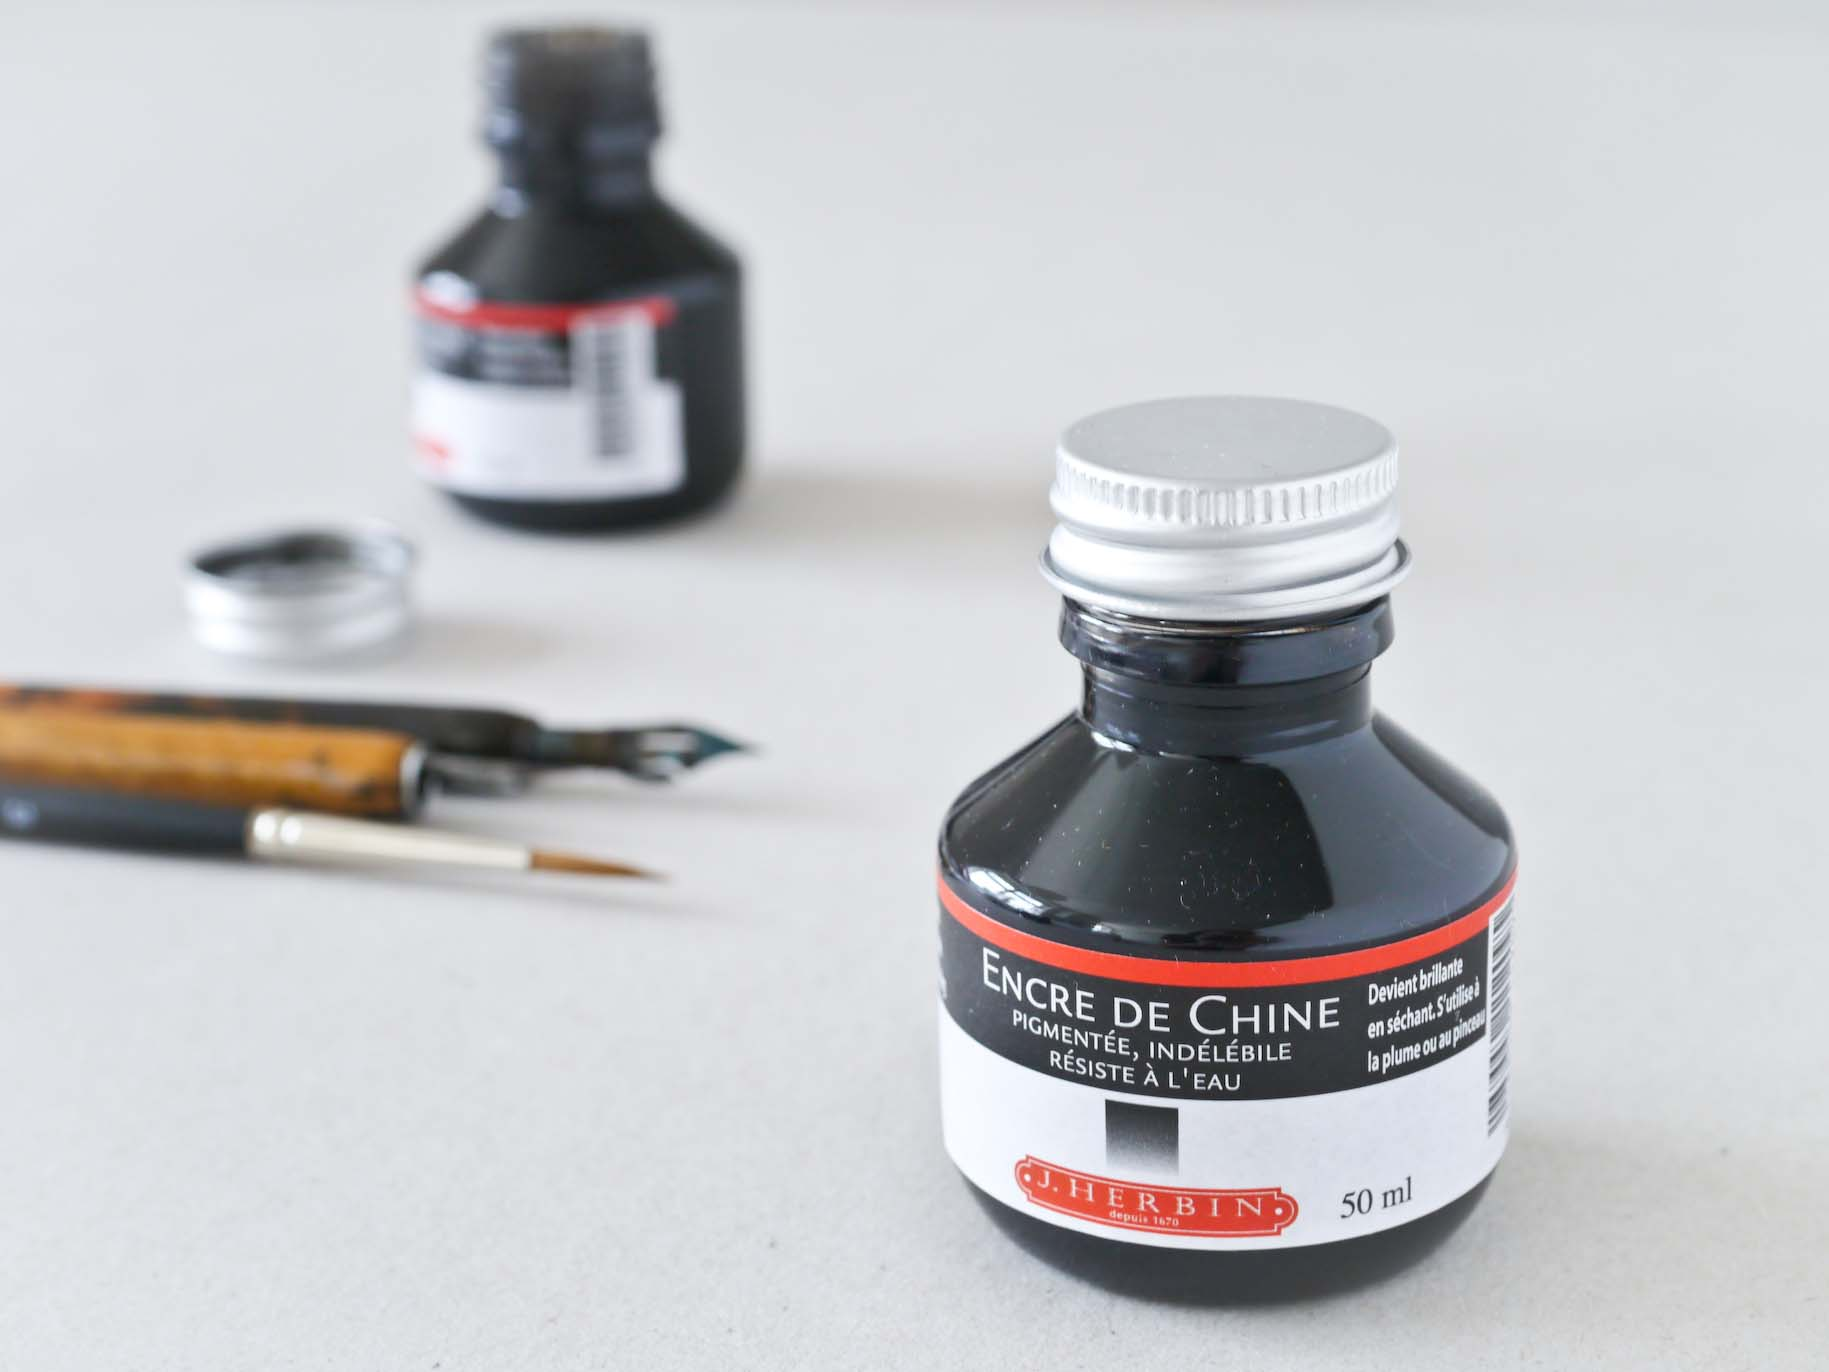 J Herbin India Ink 50 ml Encre de Chine Kinesisk tusch